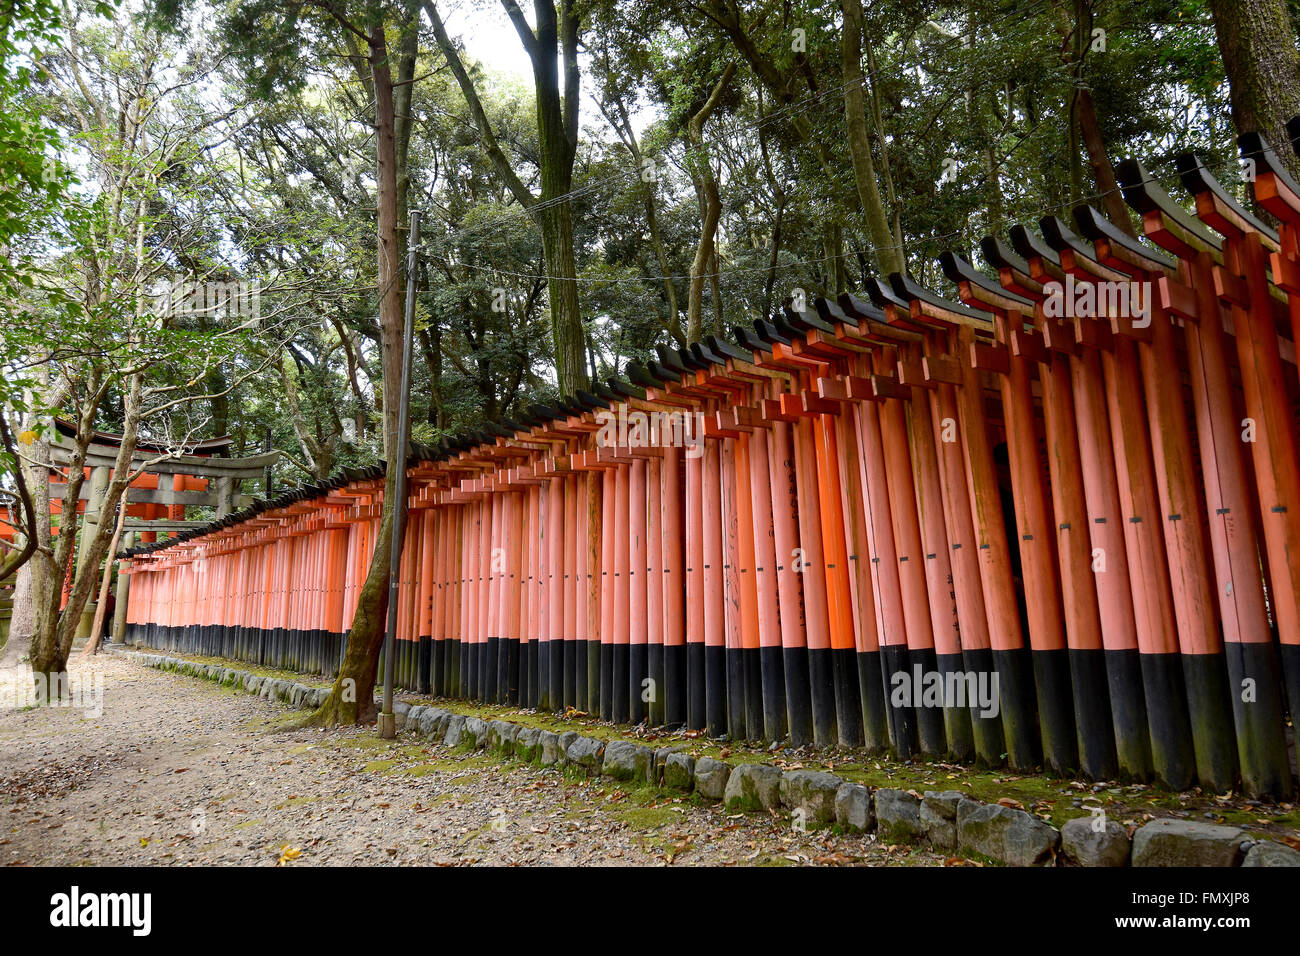 Fushimi Inari Taisha Shrine in Kyoto, Japan - Stock Image